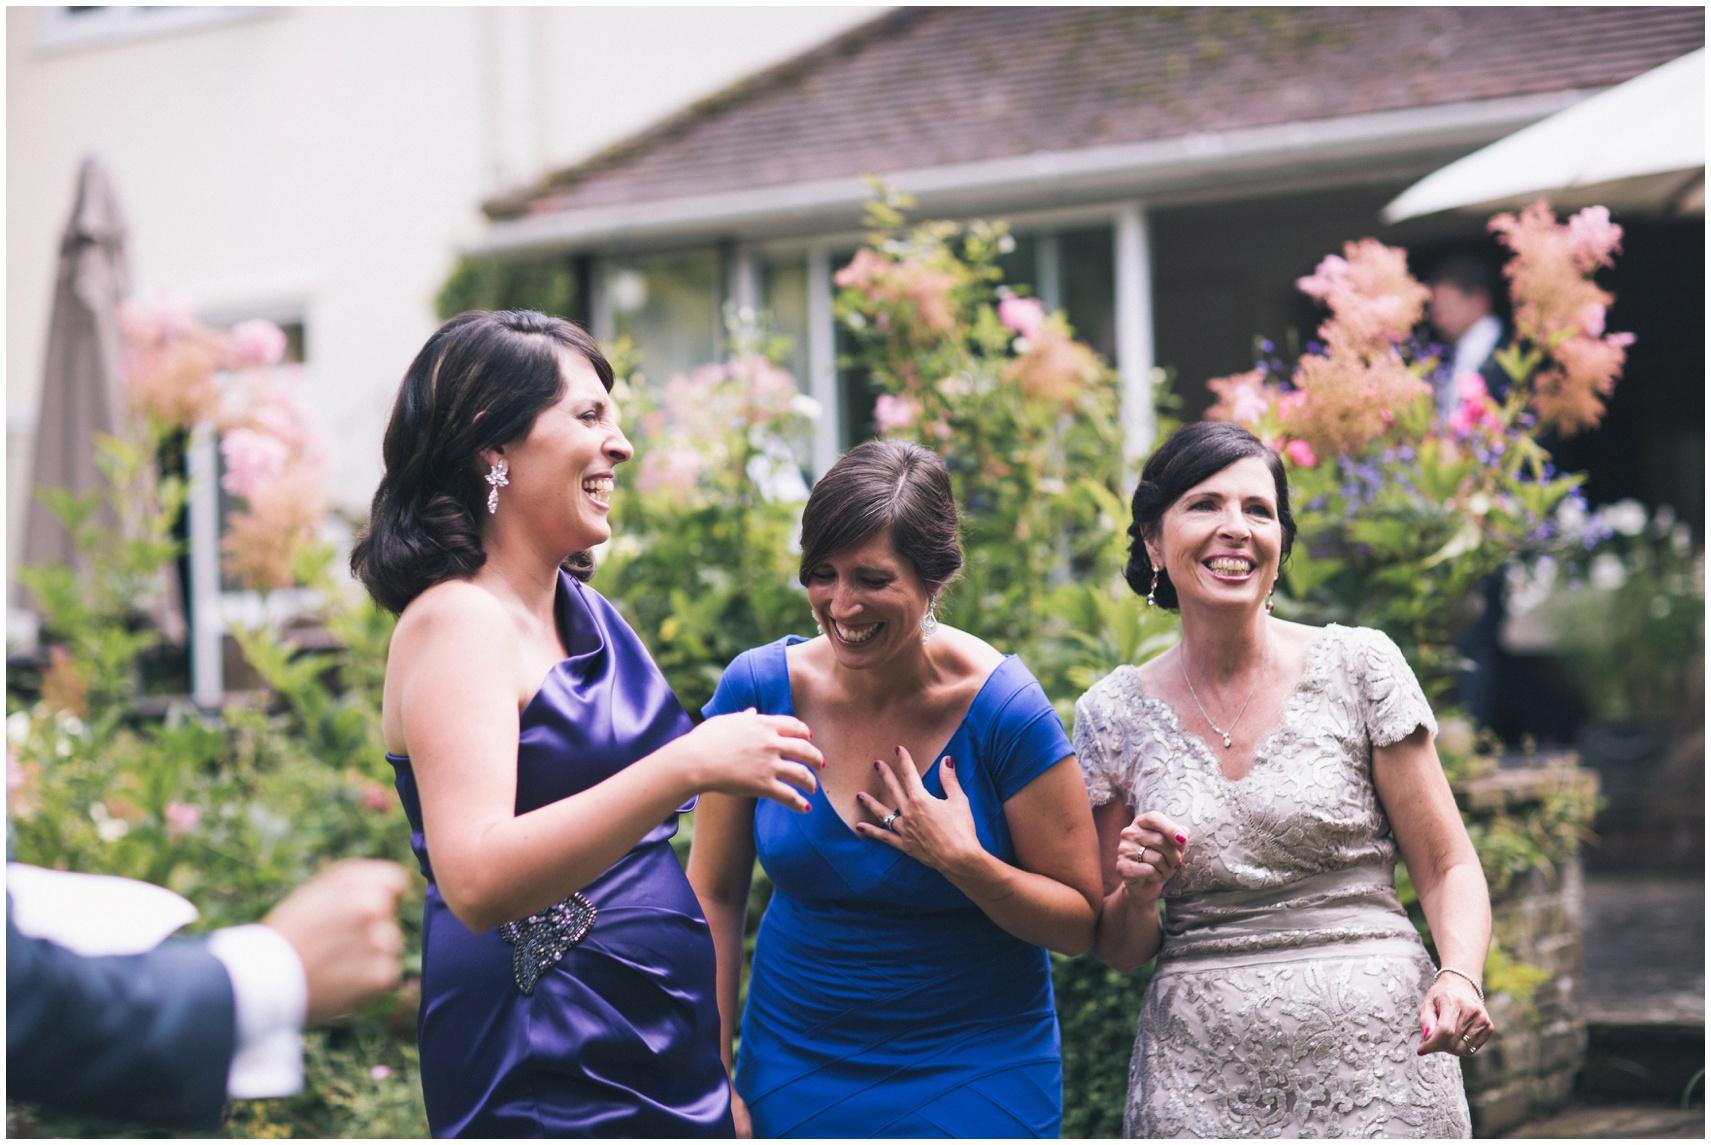 BMC Wedding photography Rutland_0263.jpg